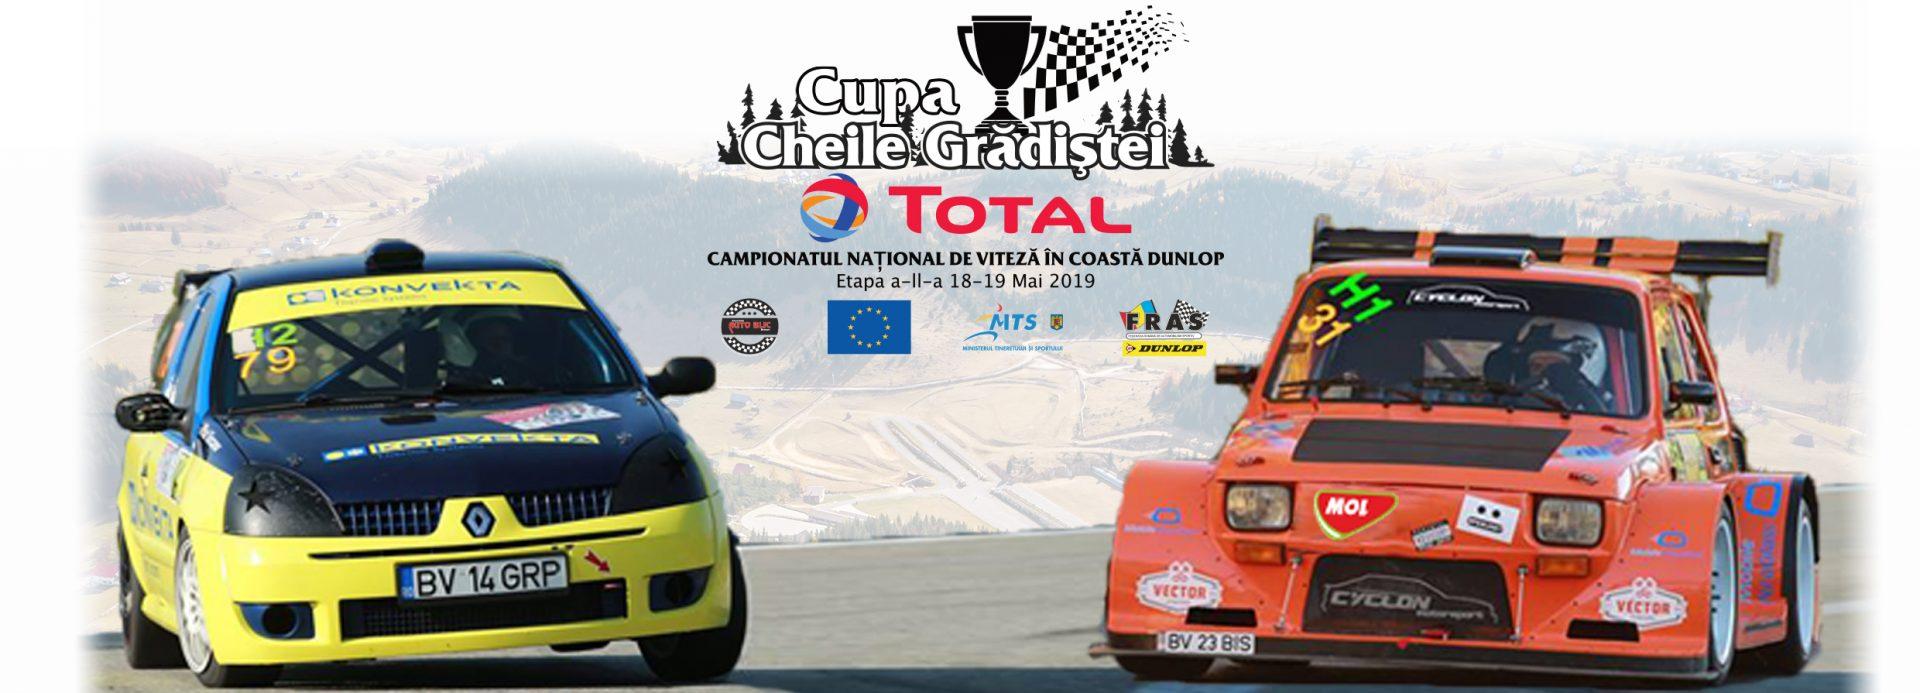 Campionatul National de Viteza in Coasta continua la Cheile Gradistei